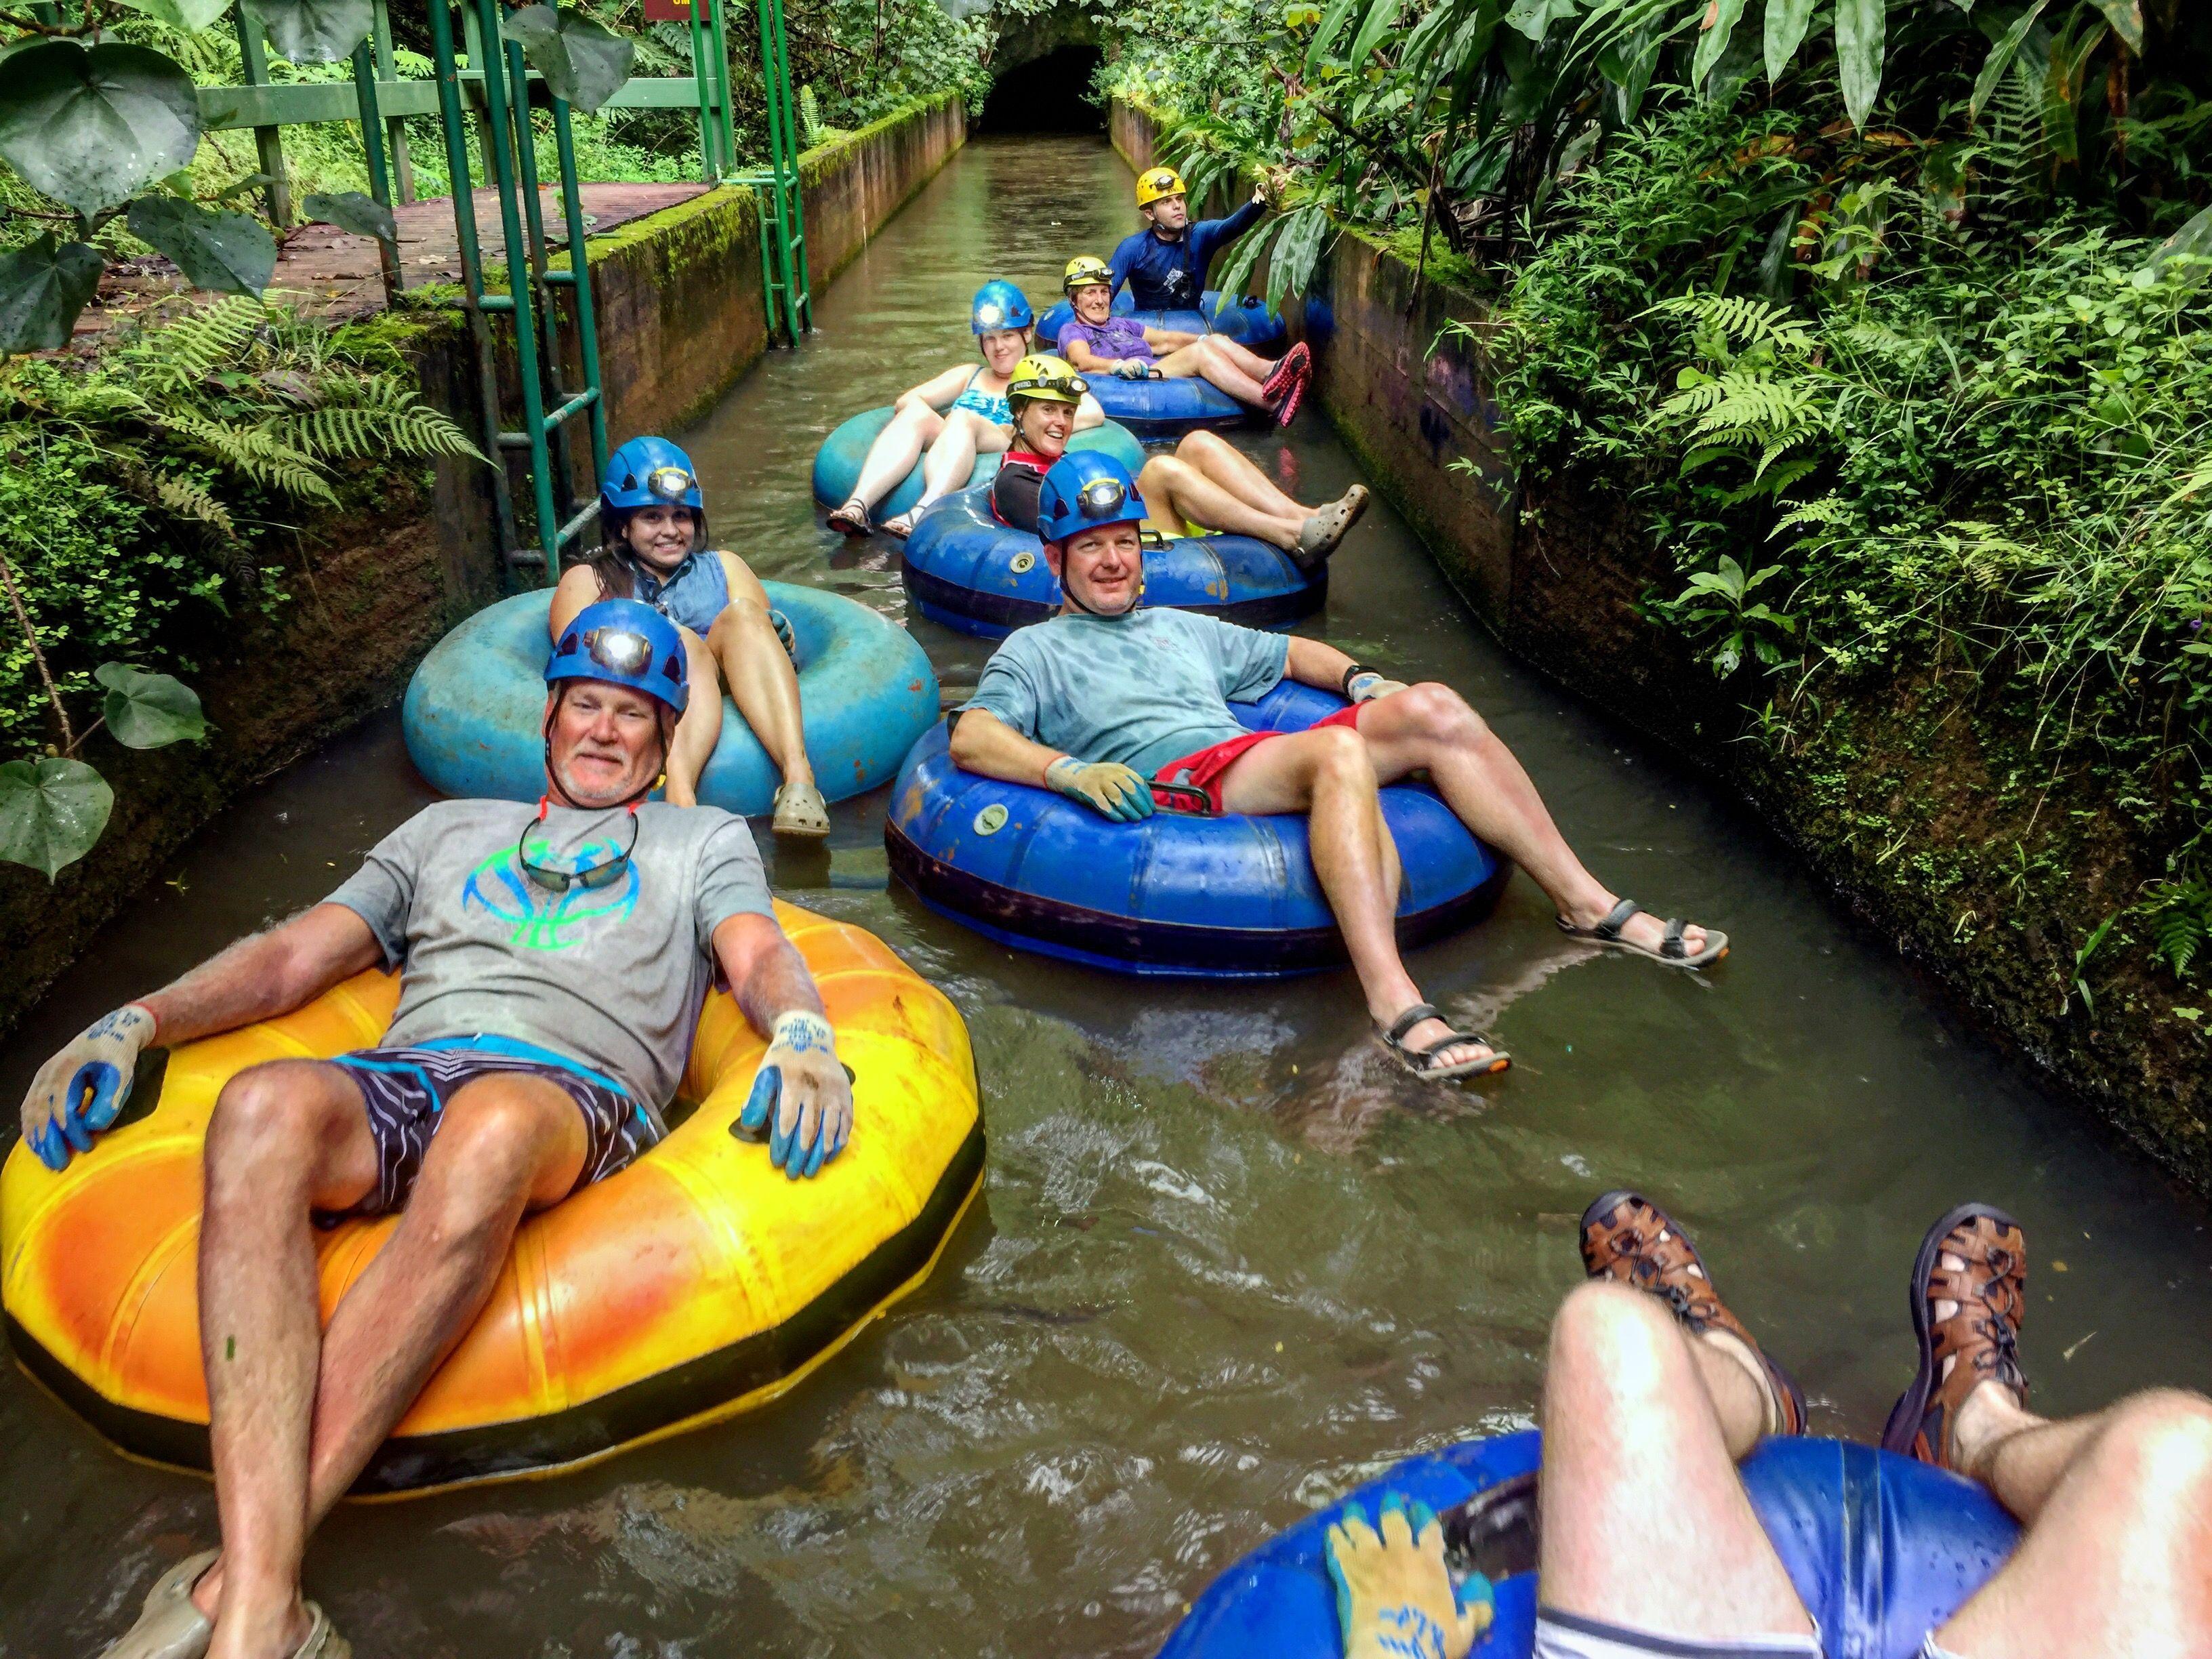 Just go with the flow!!🙌🏾❤️🤗💙🏞🌿✨🤙🏾🤙🏾 #tubing #tubingkauai #kauaitubing #kauai #lethawaiihappen #gowiththeflow #hawaii #kauaibound #hawaiibound #vacation